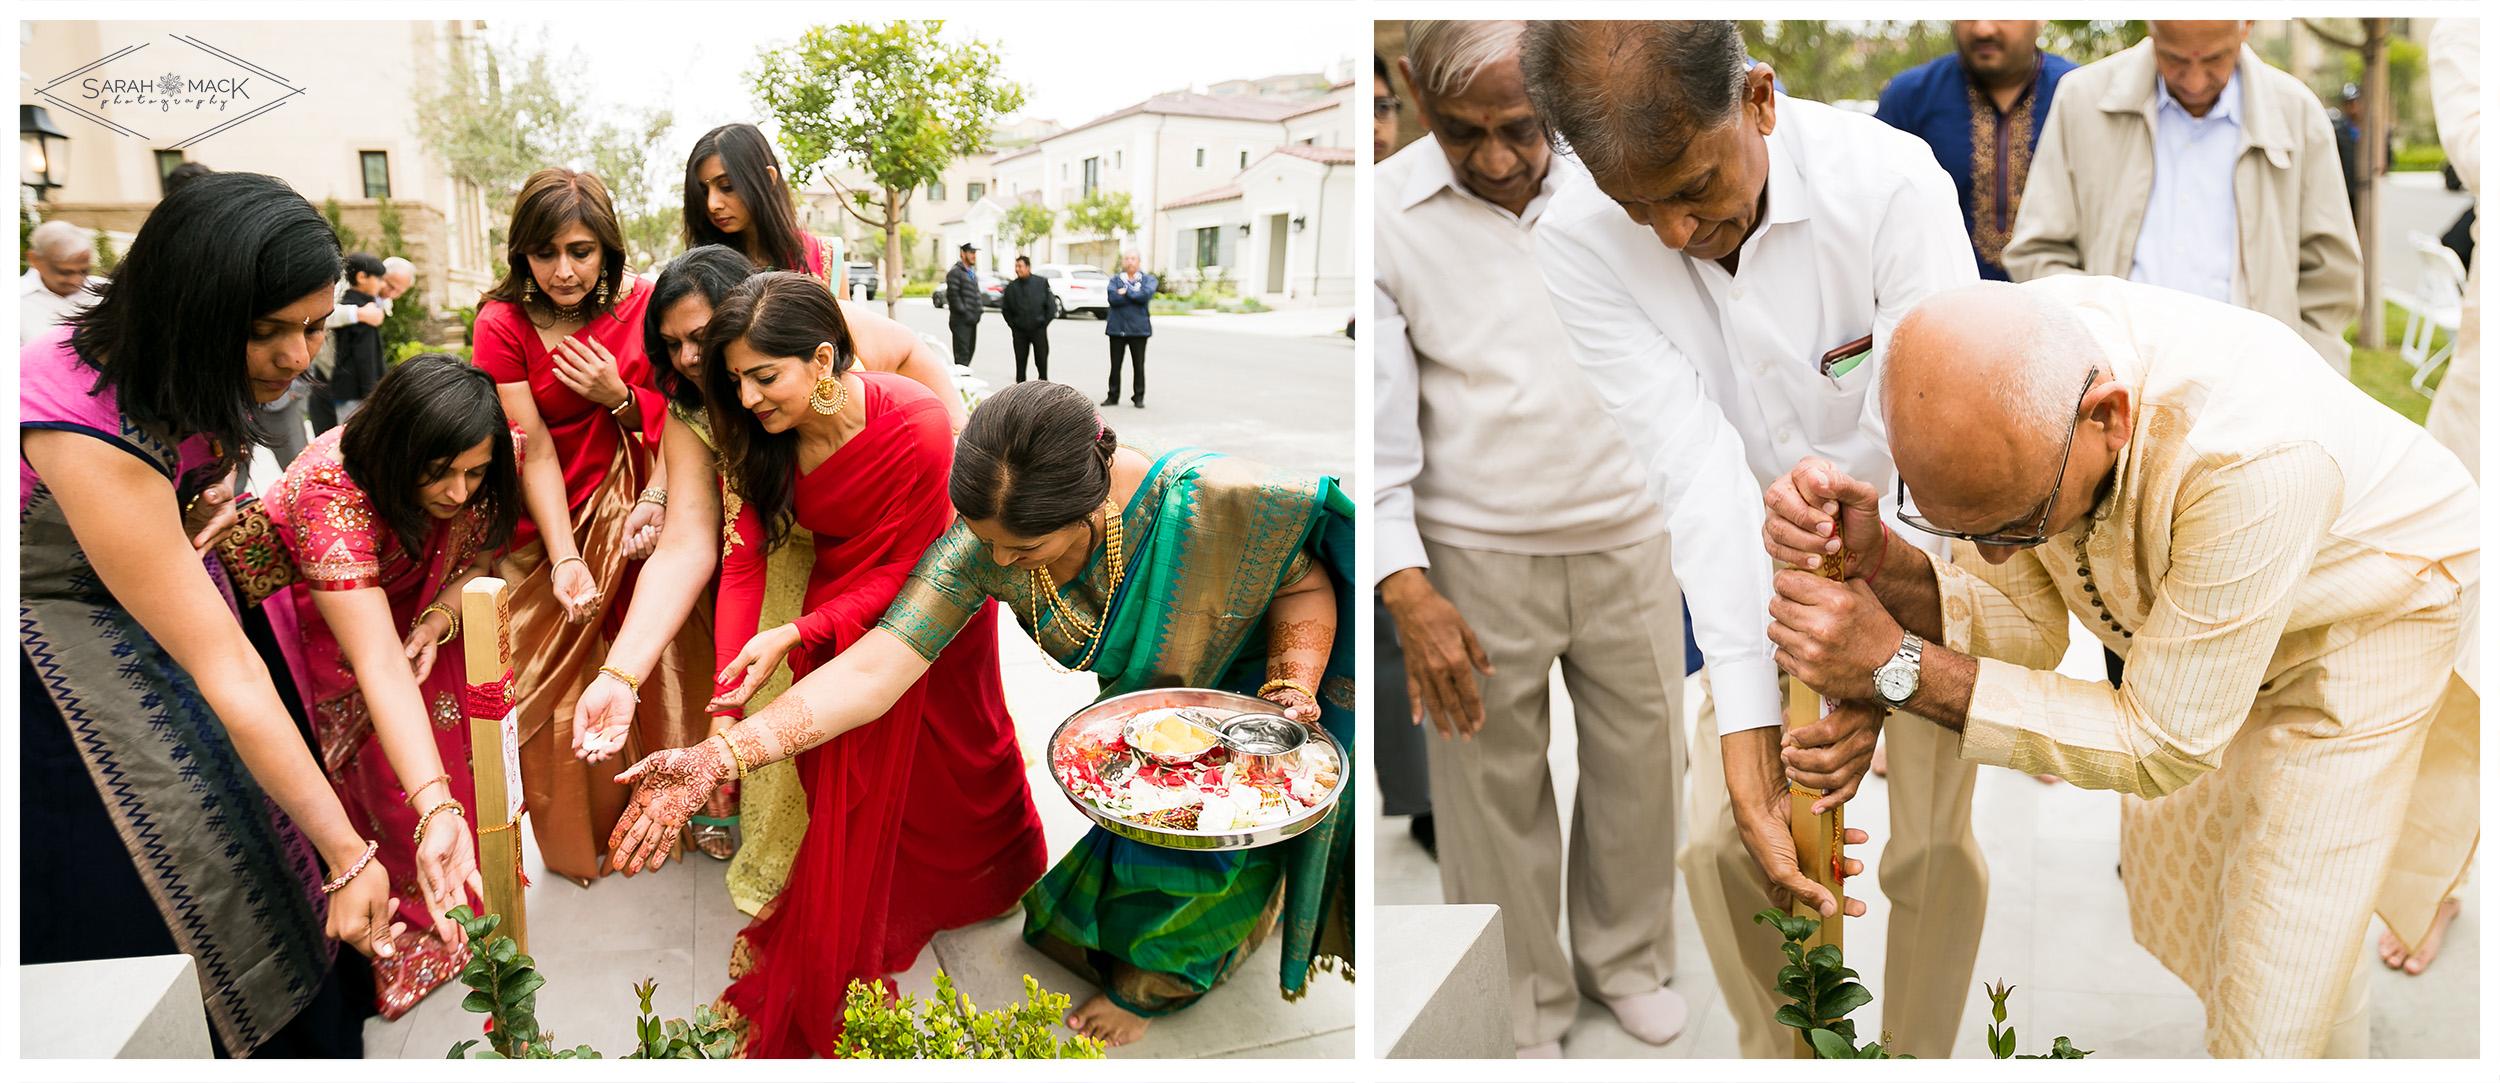 PR-Irvine-Ganesh-Pooja-Indian-Wedding-Photography-9.jpg